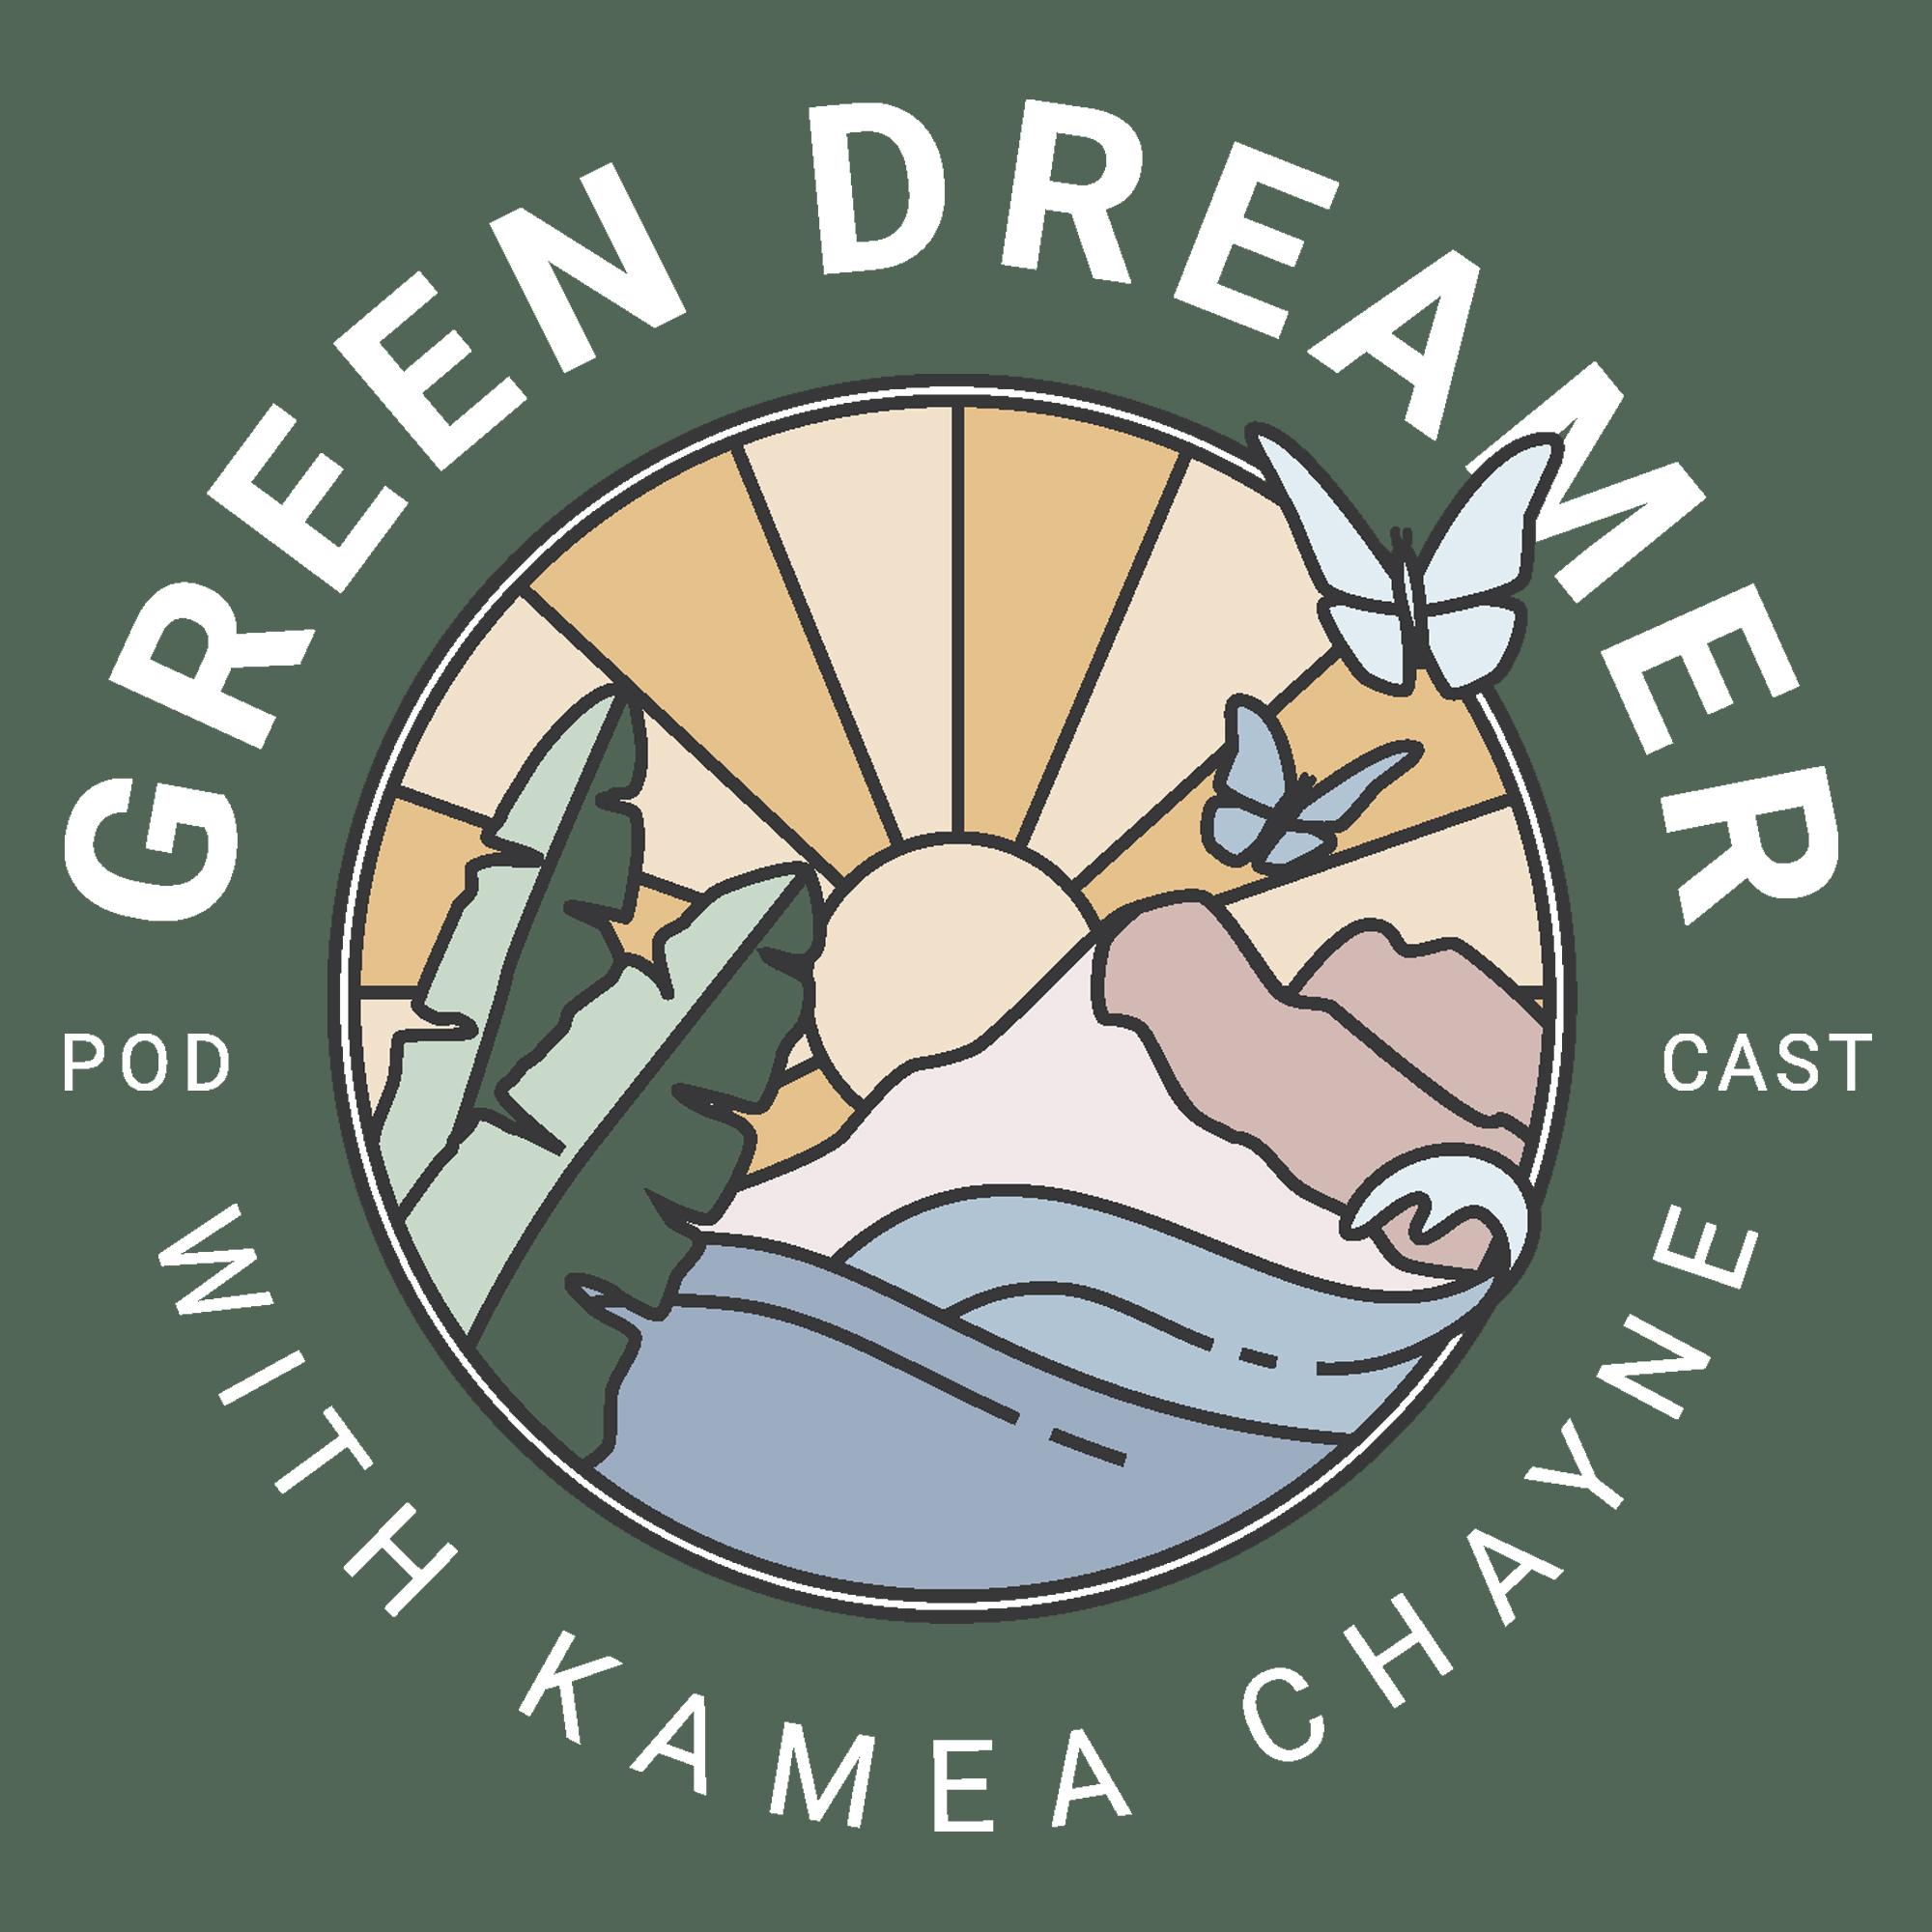 sustainability environmental podcasts | green dreamer